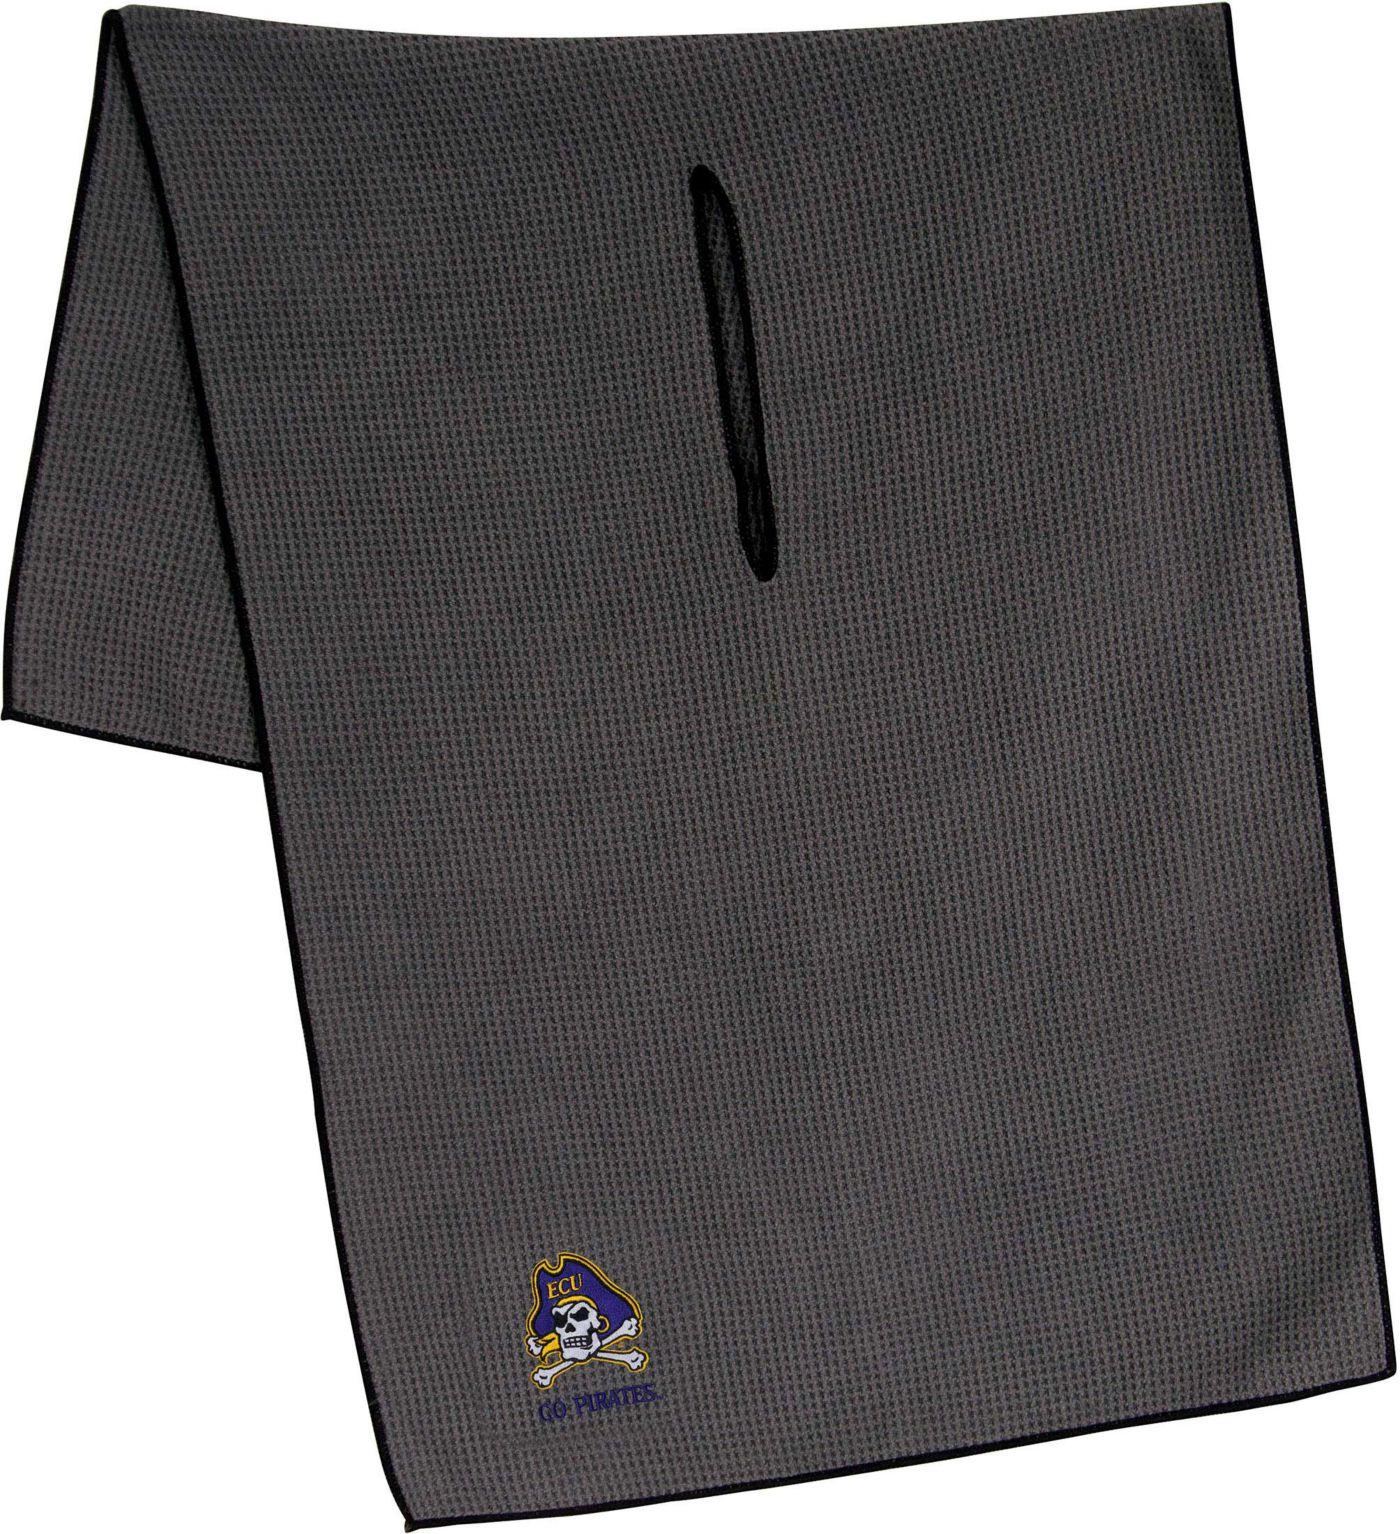 "Team Effort East Carolina Pirates 19"" x 41"" Microfiber Golf Towel"